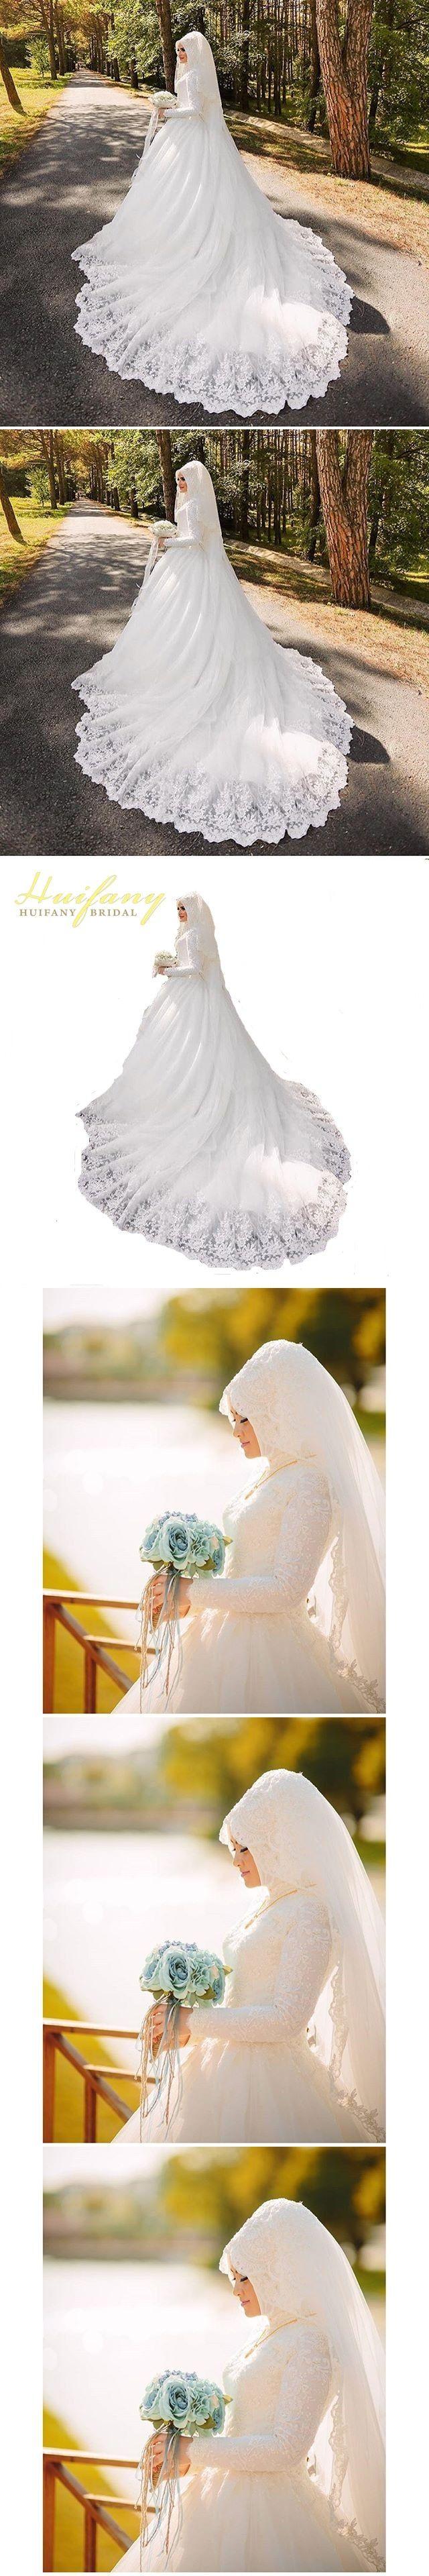 Arabic Muslim Beautiful Long Sleeve Hijab Wedding Dress with Veil Lace  Applique Vestido De Noiva 18b73570bdd1